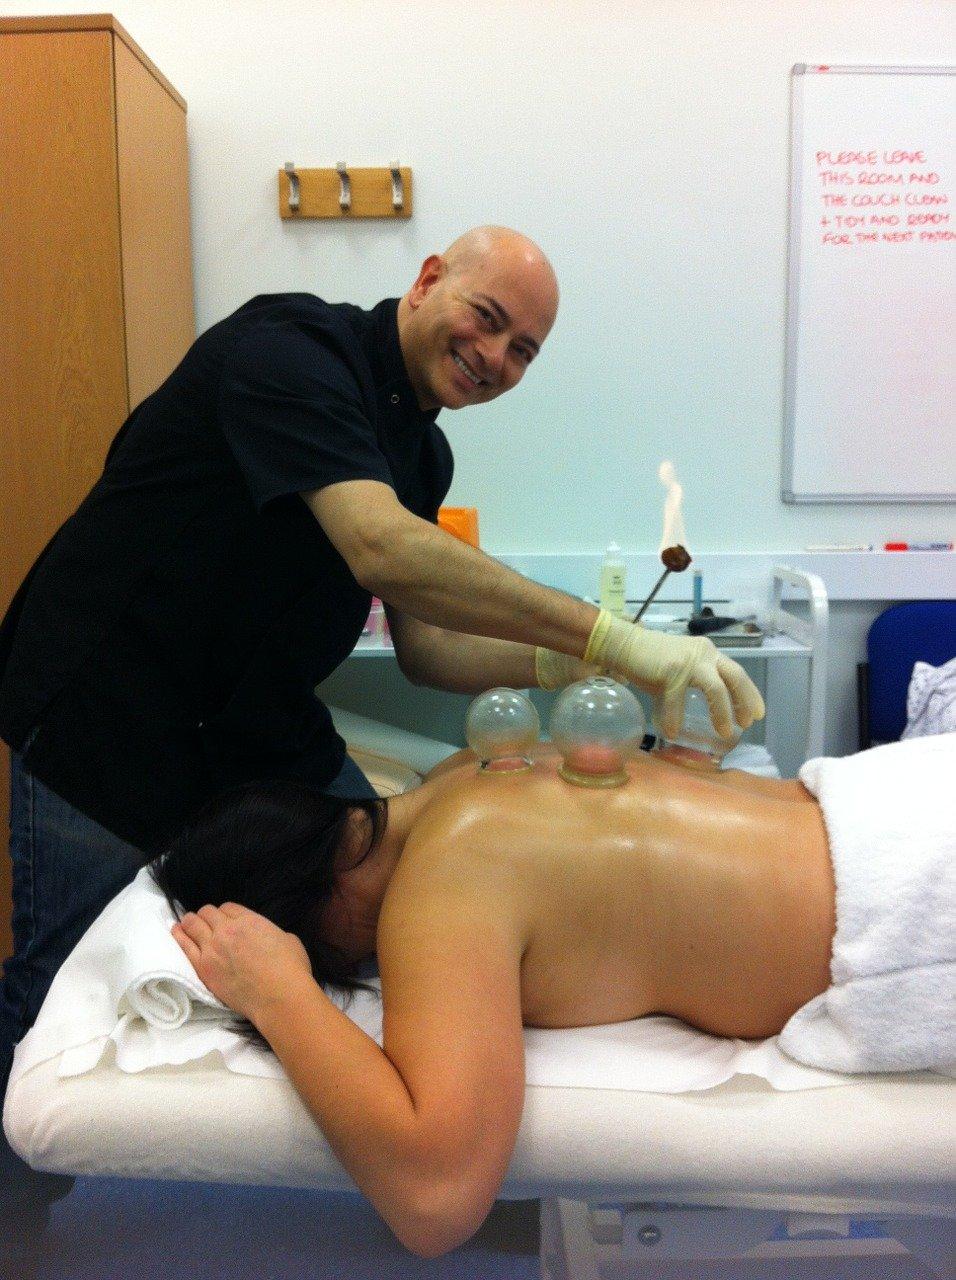 Fysiotherapie Koen den Hollander fysiotherapeut opleiding